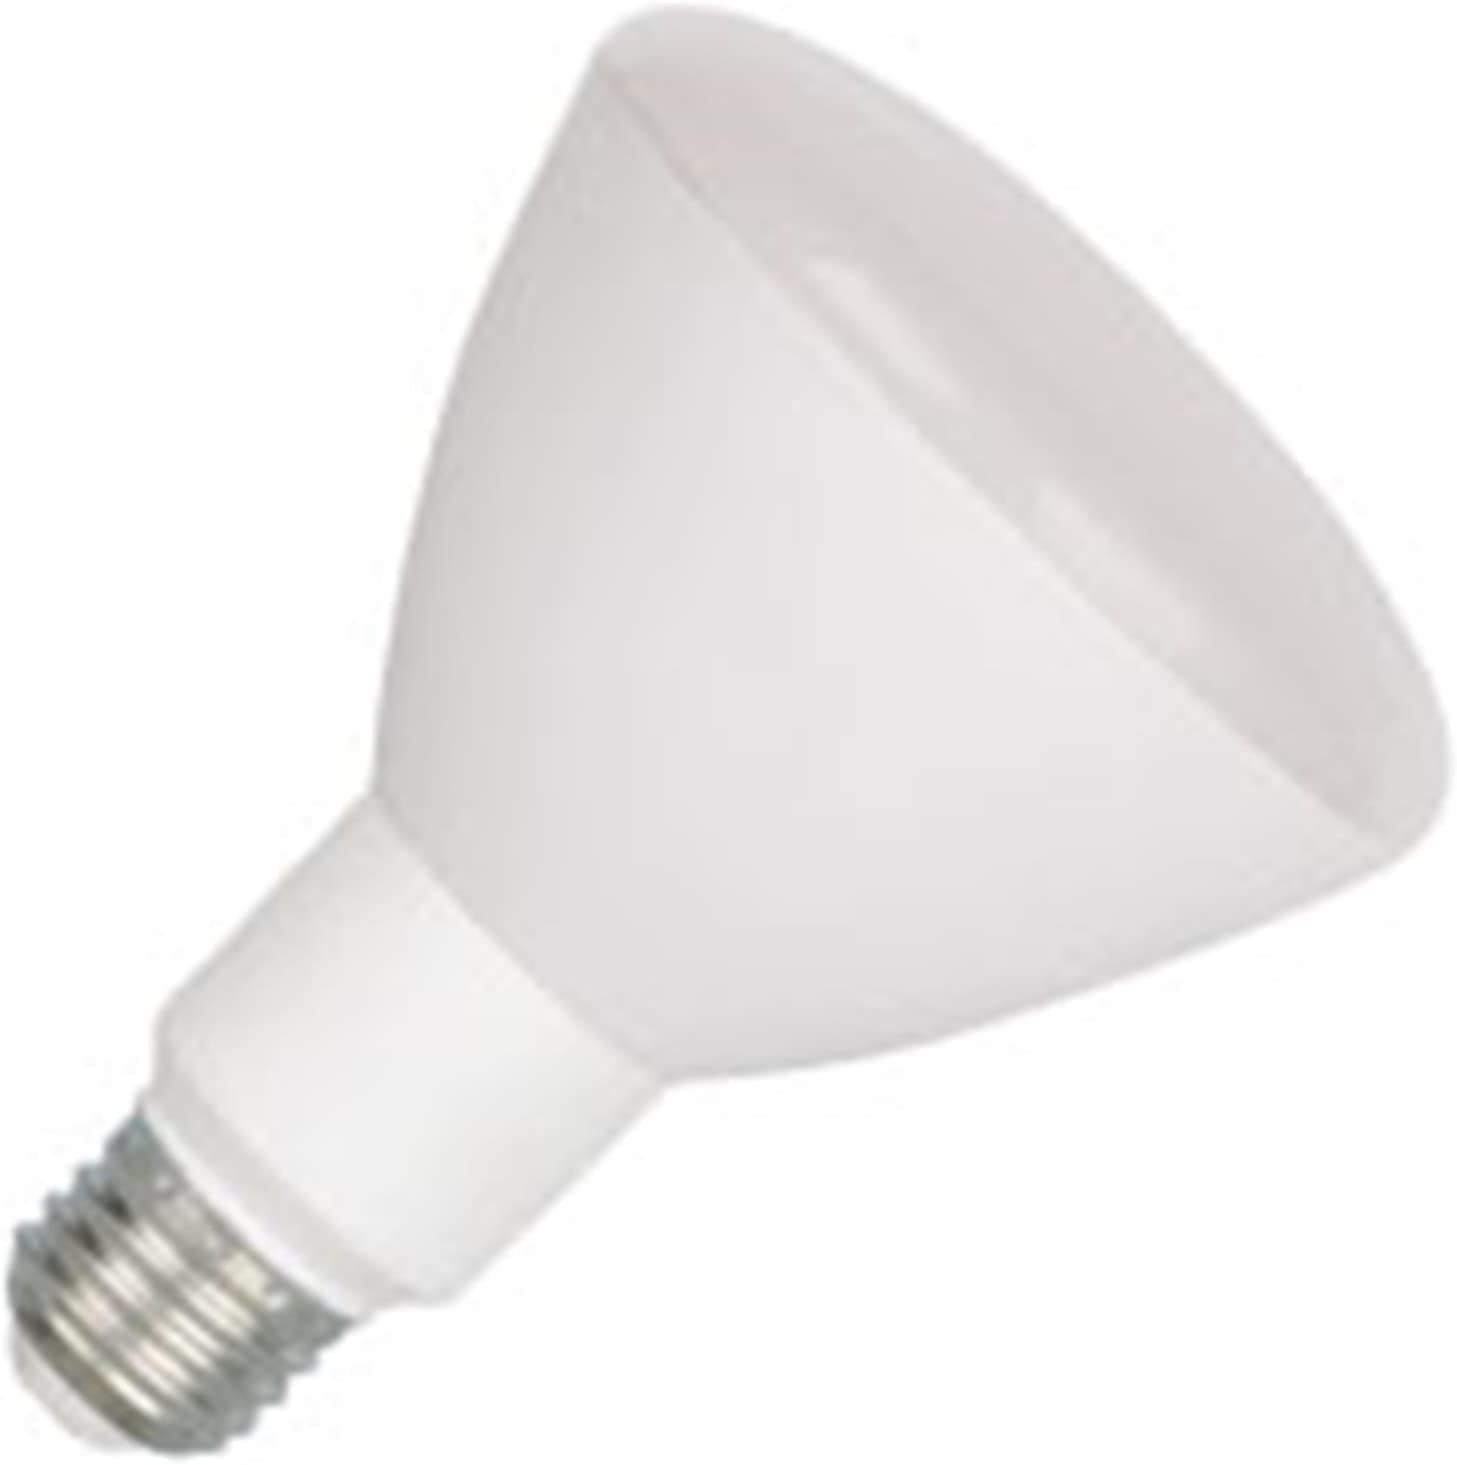 BR30FL11//830//LED BR30 Flood LED Light Bulb Halco BC3694 80088